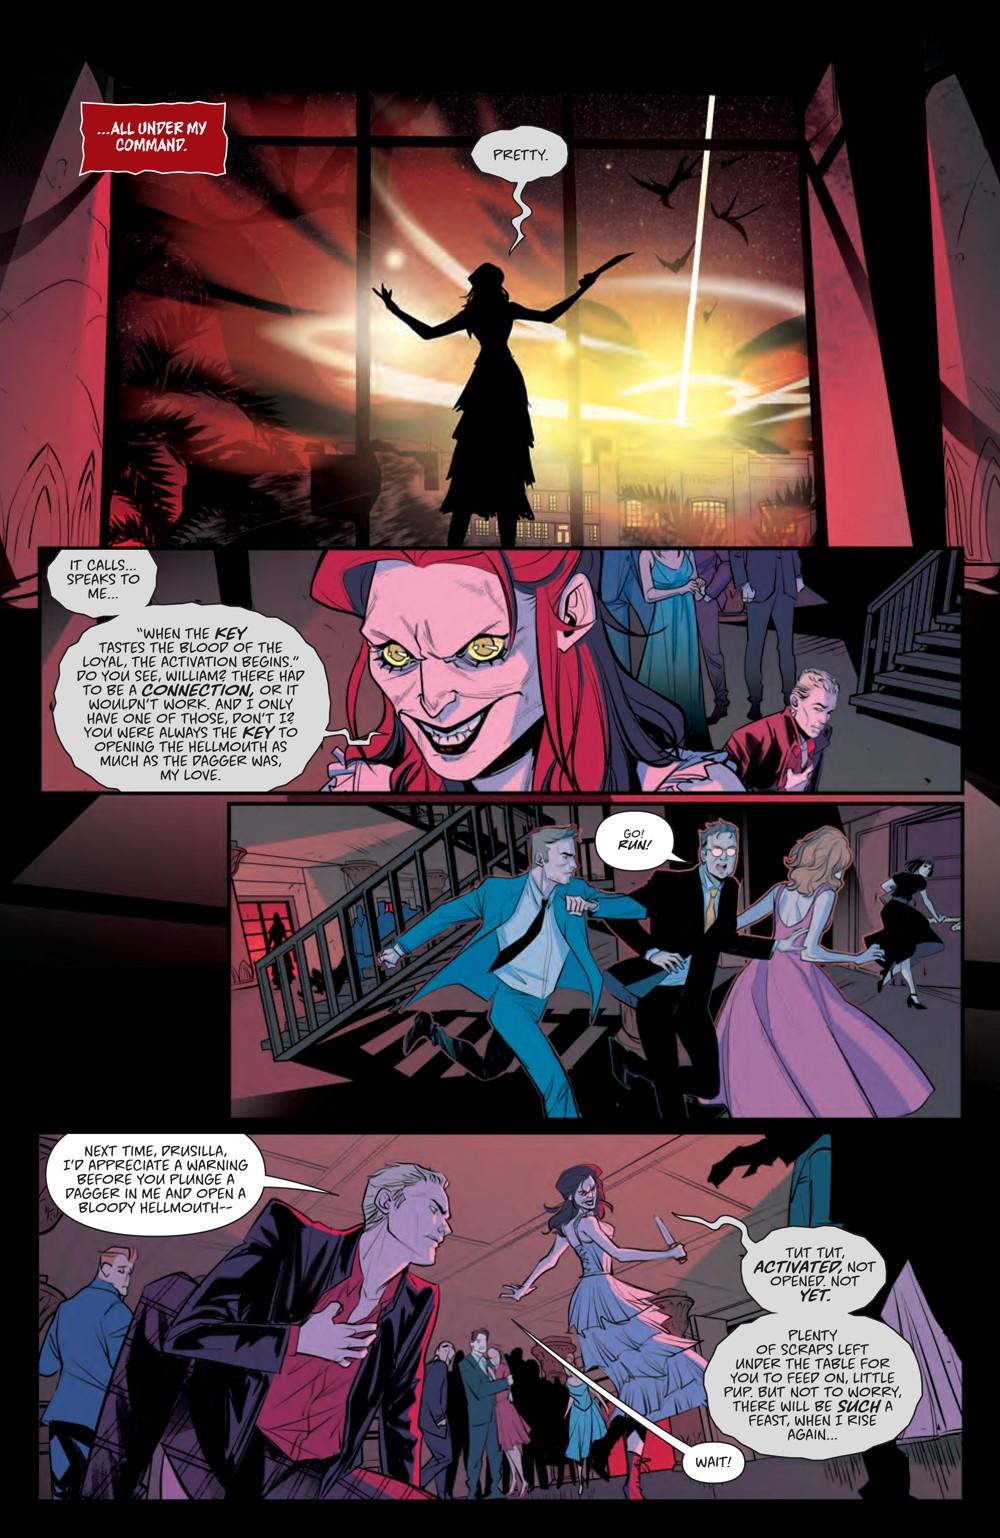 Hellmouth_SC_PRESS_10 ComicList Previews: BUFFY THE VAMPIRE SLAYER HELLMOUTH TP